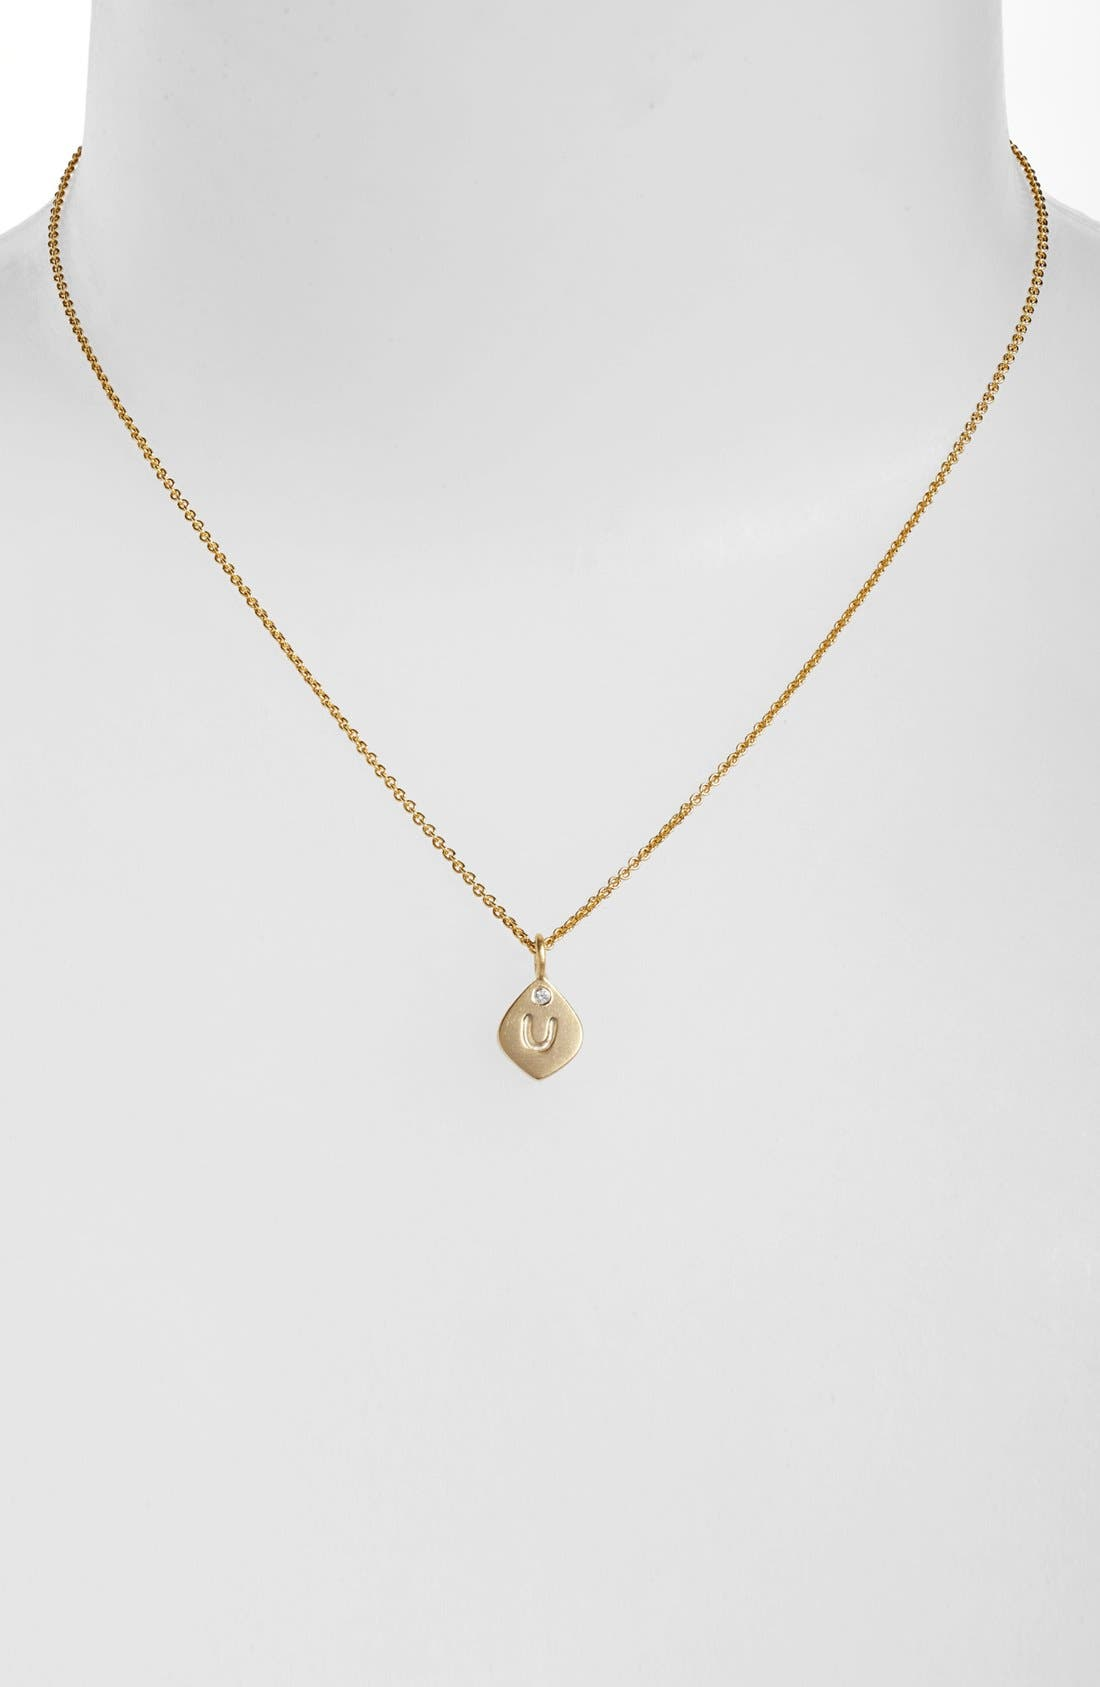 Main Image - NuNu Designs Small Initial Pendant Necklace